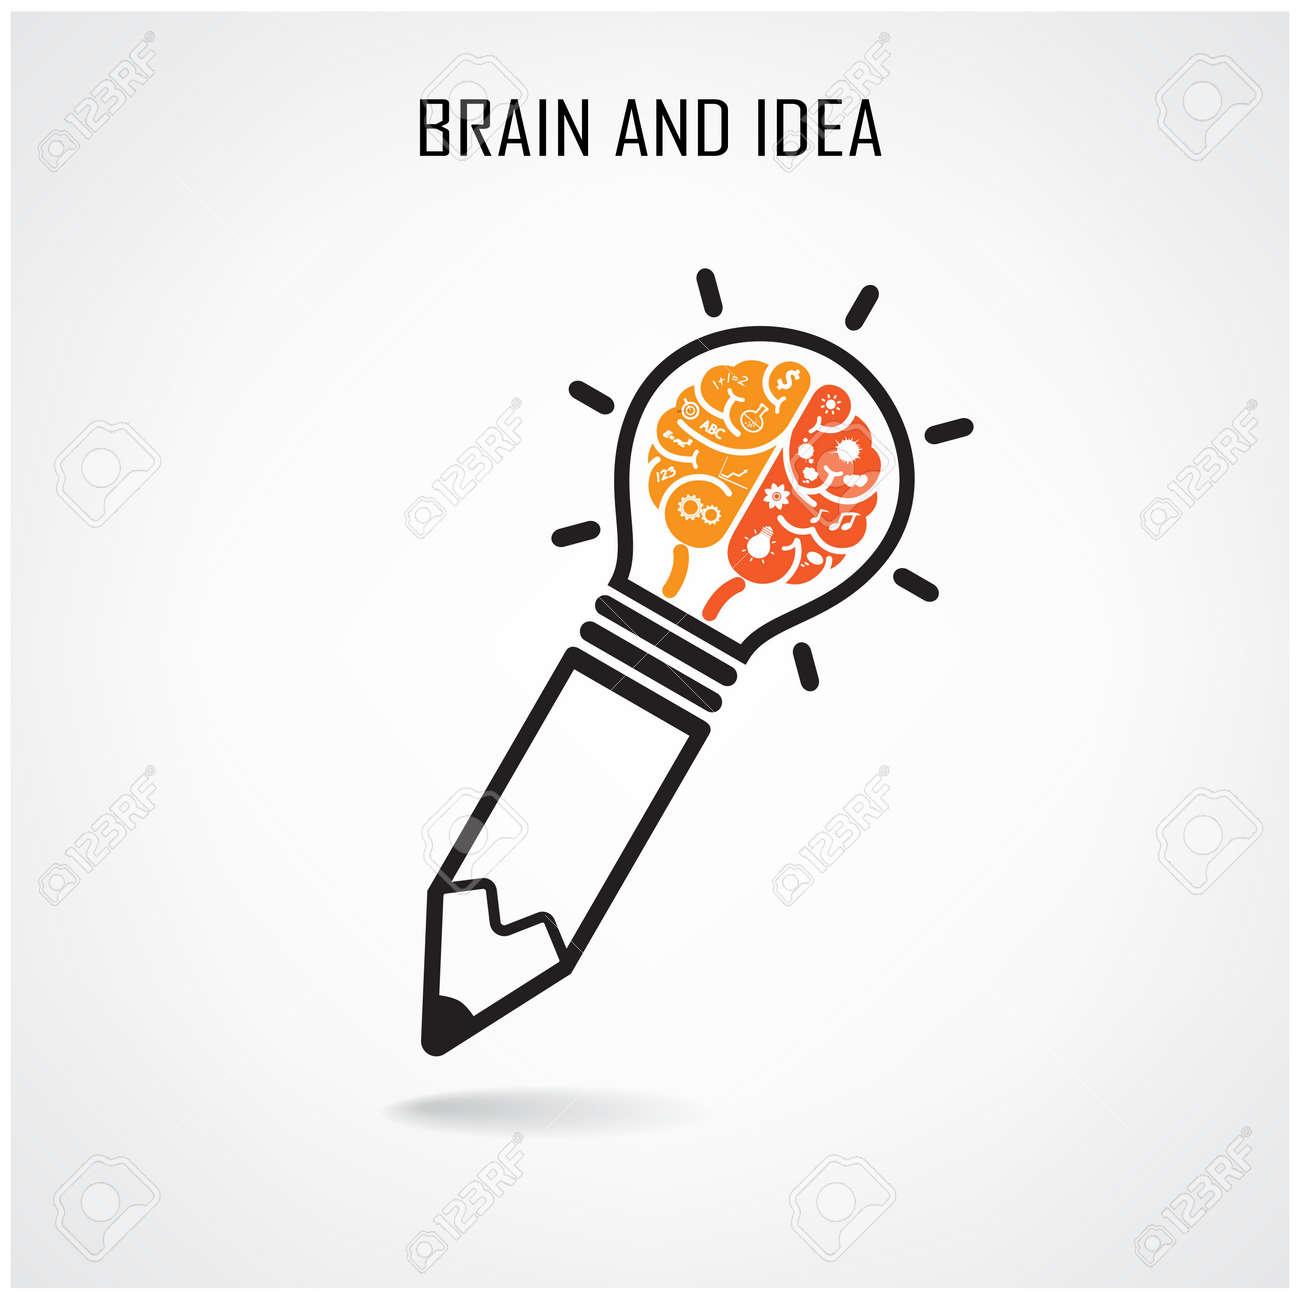 creative brain idea concept background design for poster flyer cover brochure business dea abstract idea - Idea Design